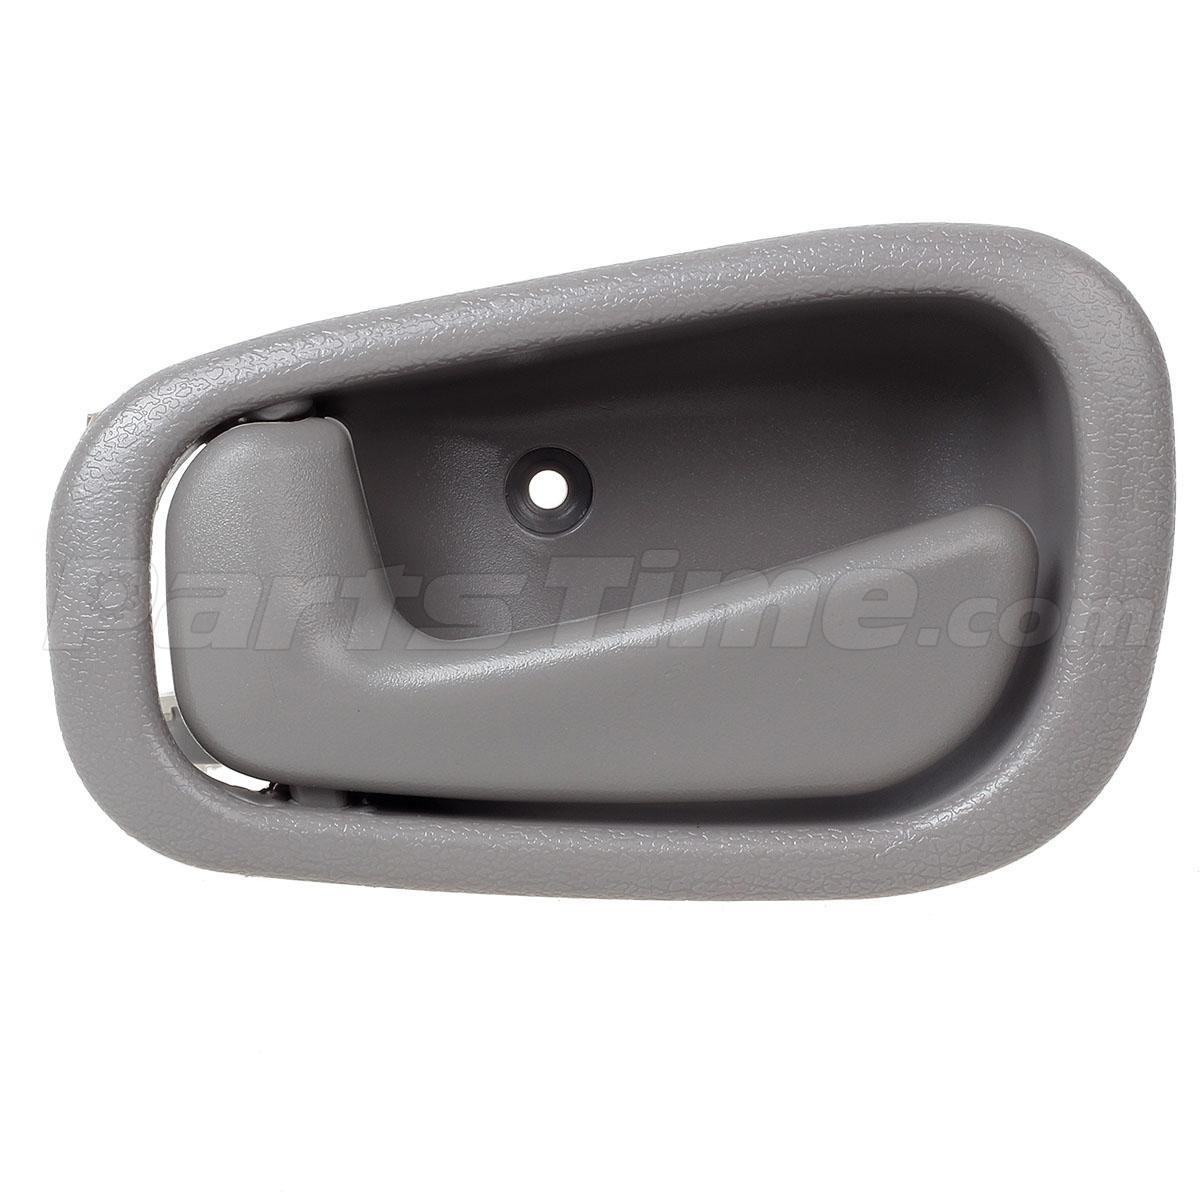 2002 Chevrolet Prizm Interior: For 1998-2002 CHEVROLET PRIZM Inside Gray Front/Rear Left